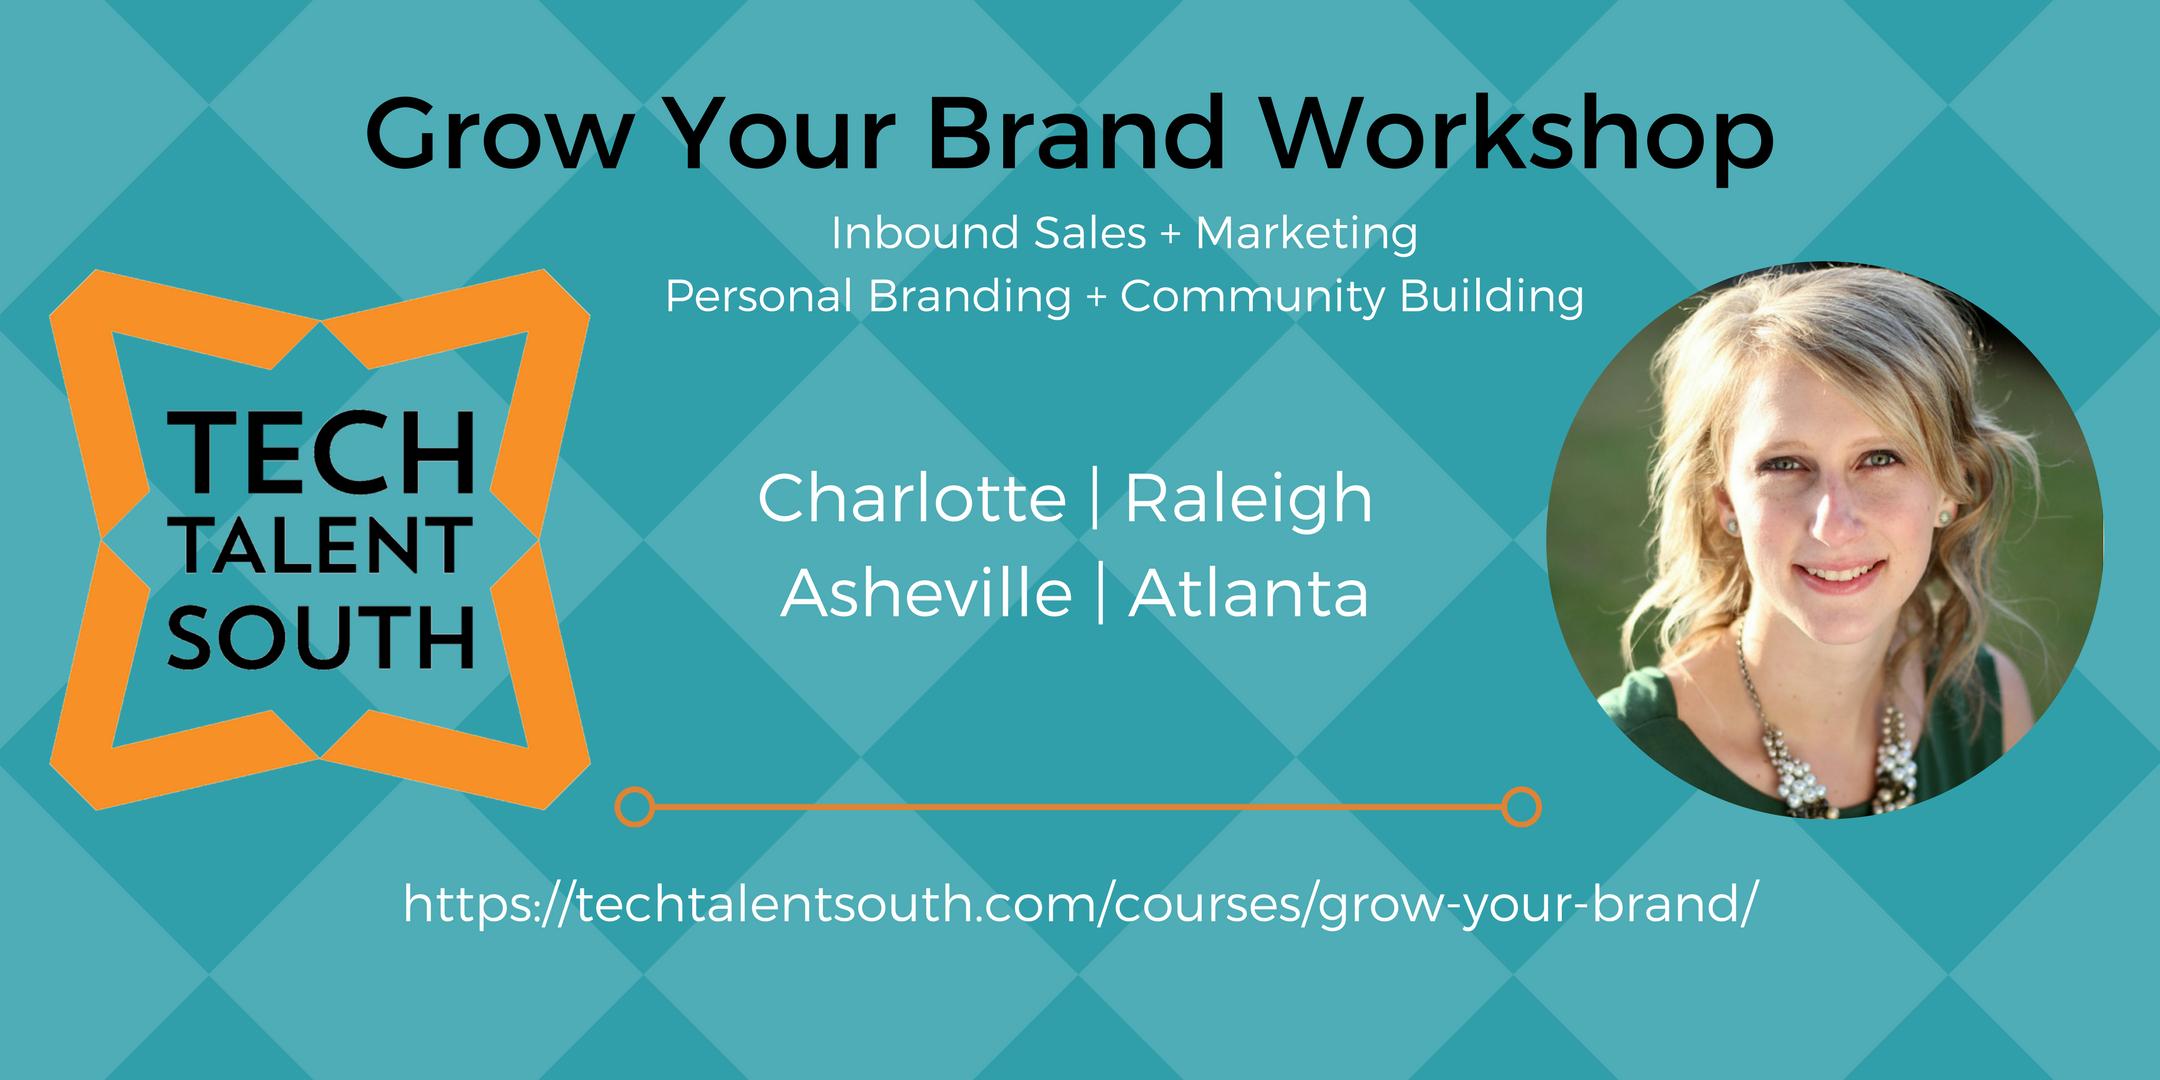 grow your brand online workshop